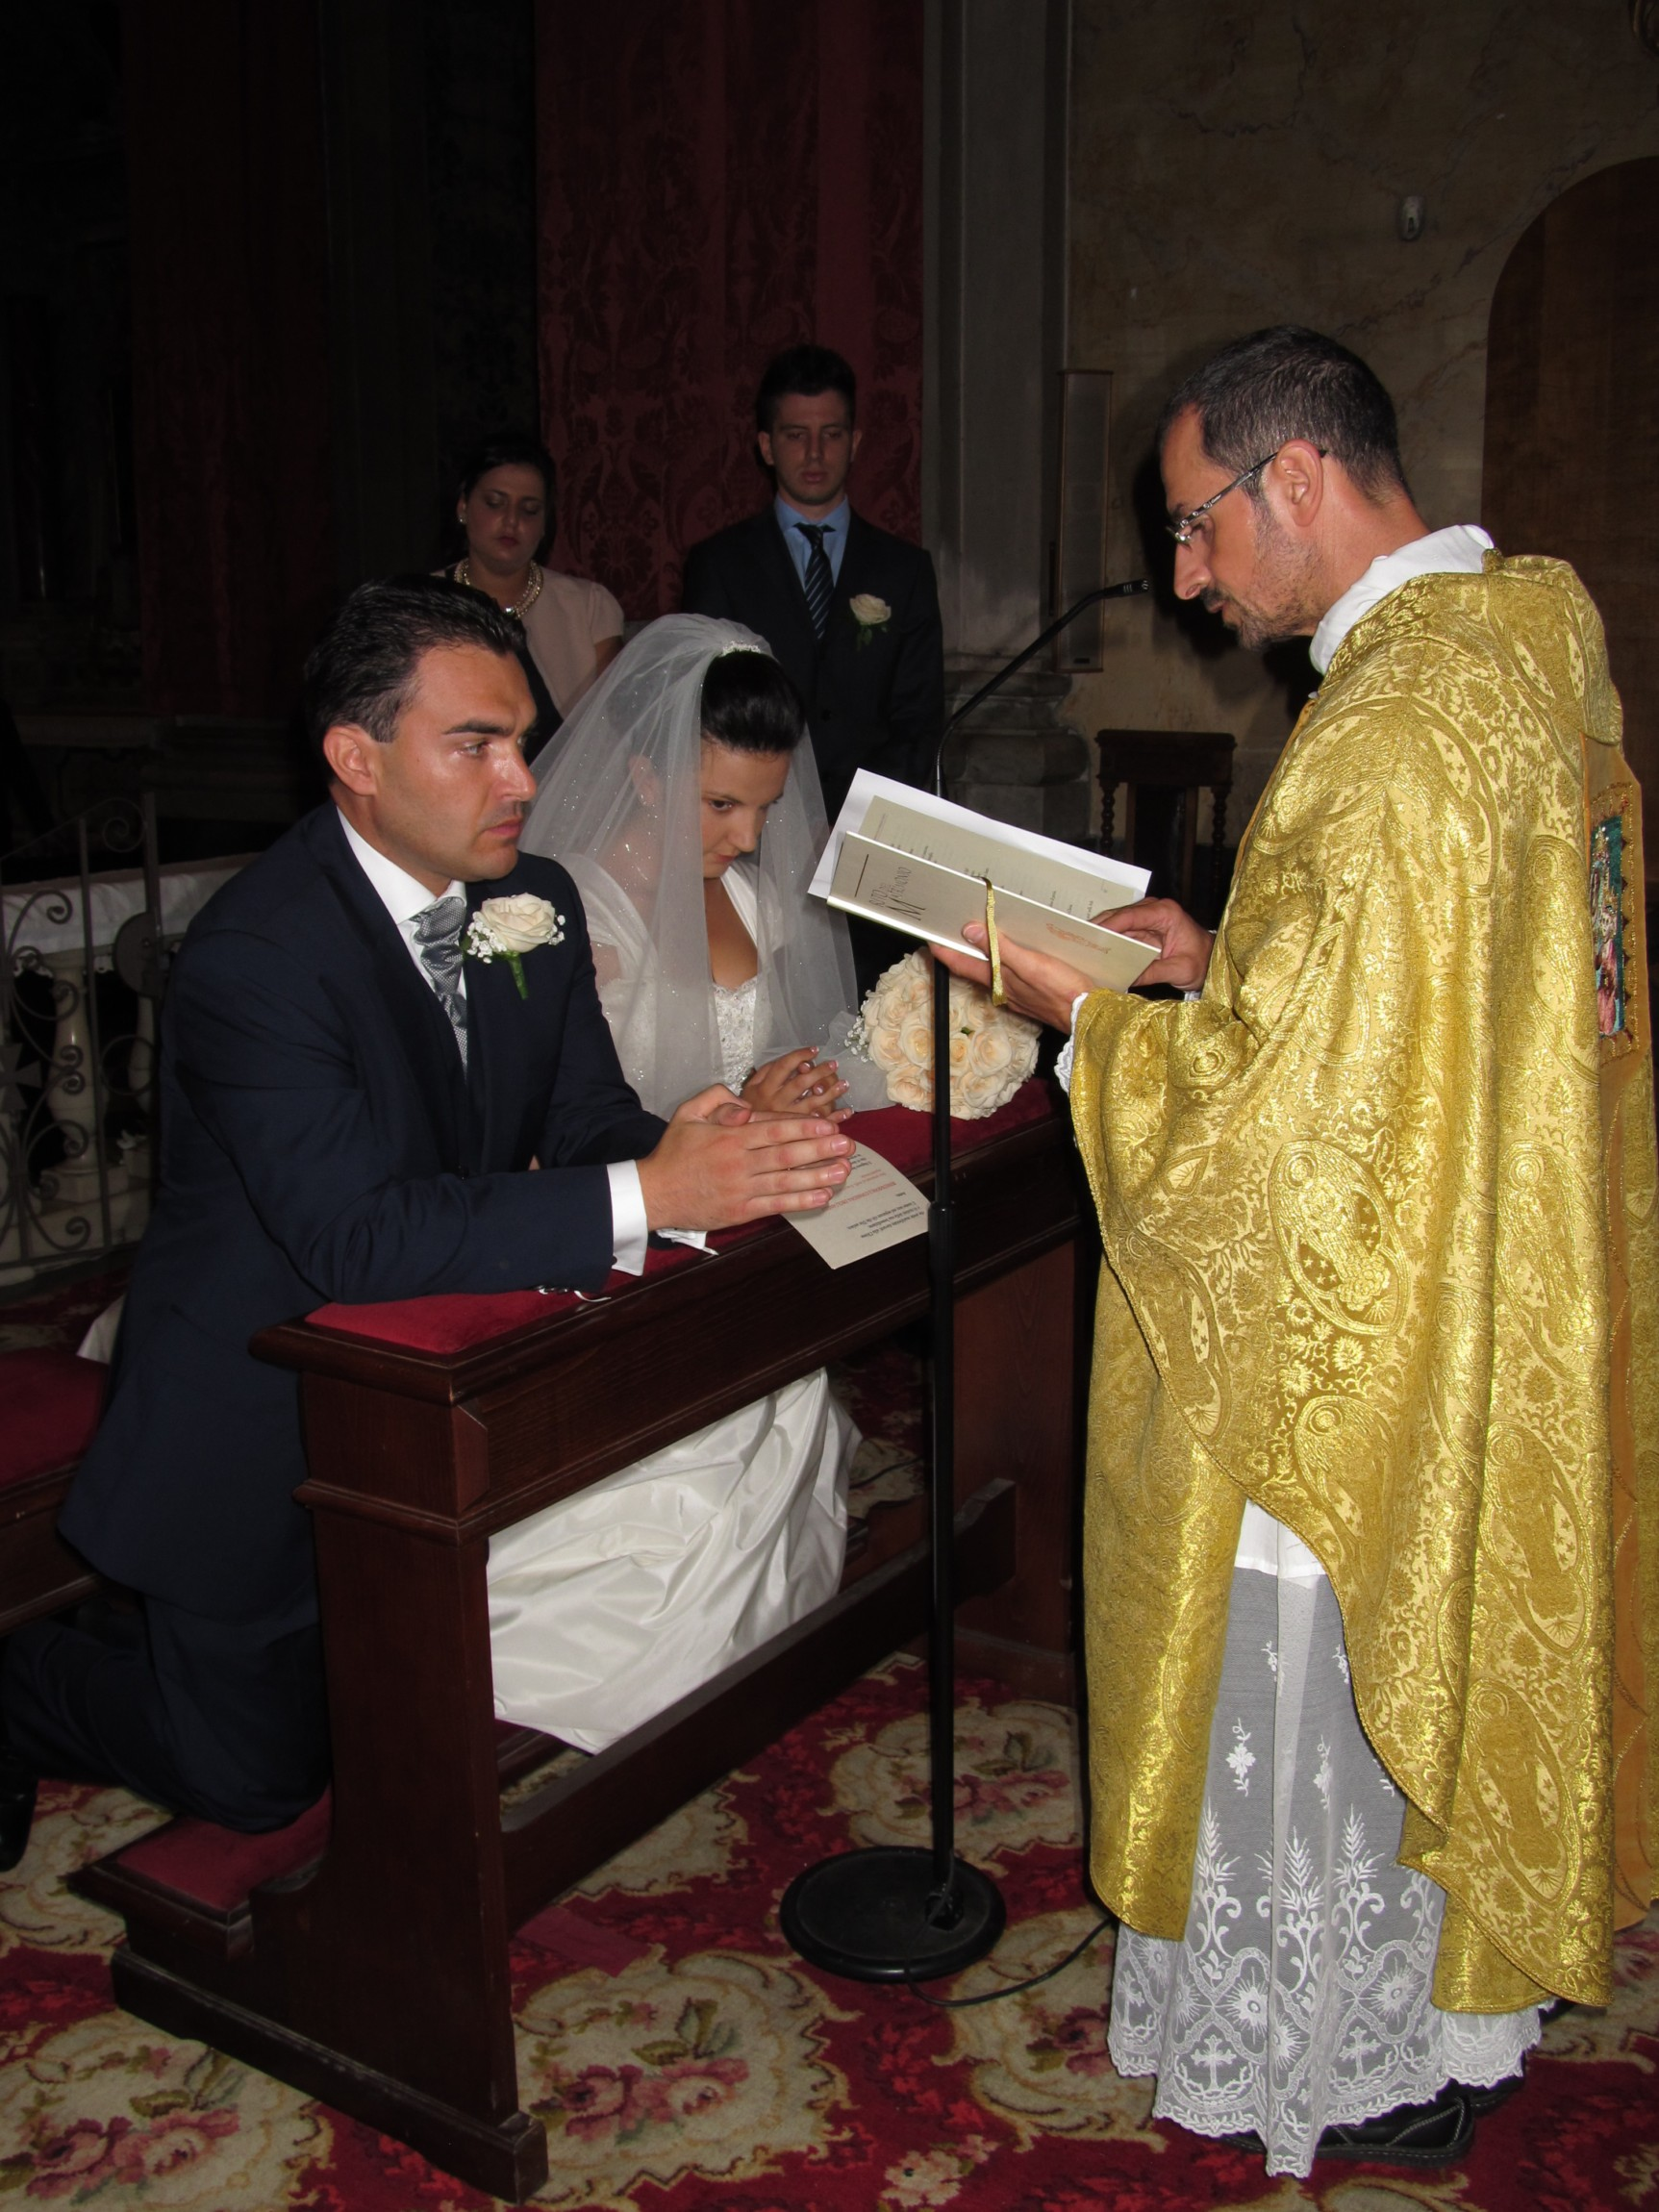 matrimonio_piccardo_franzi_2014-07-19-11-34-54